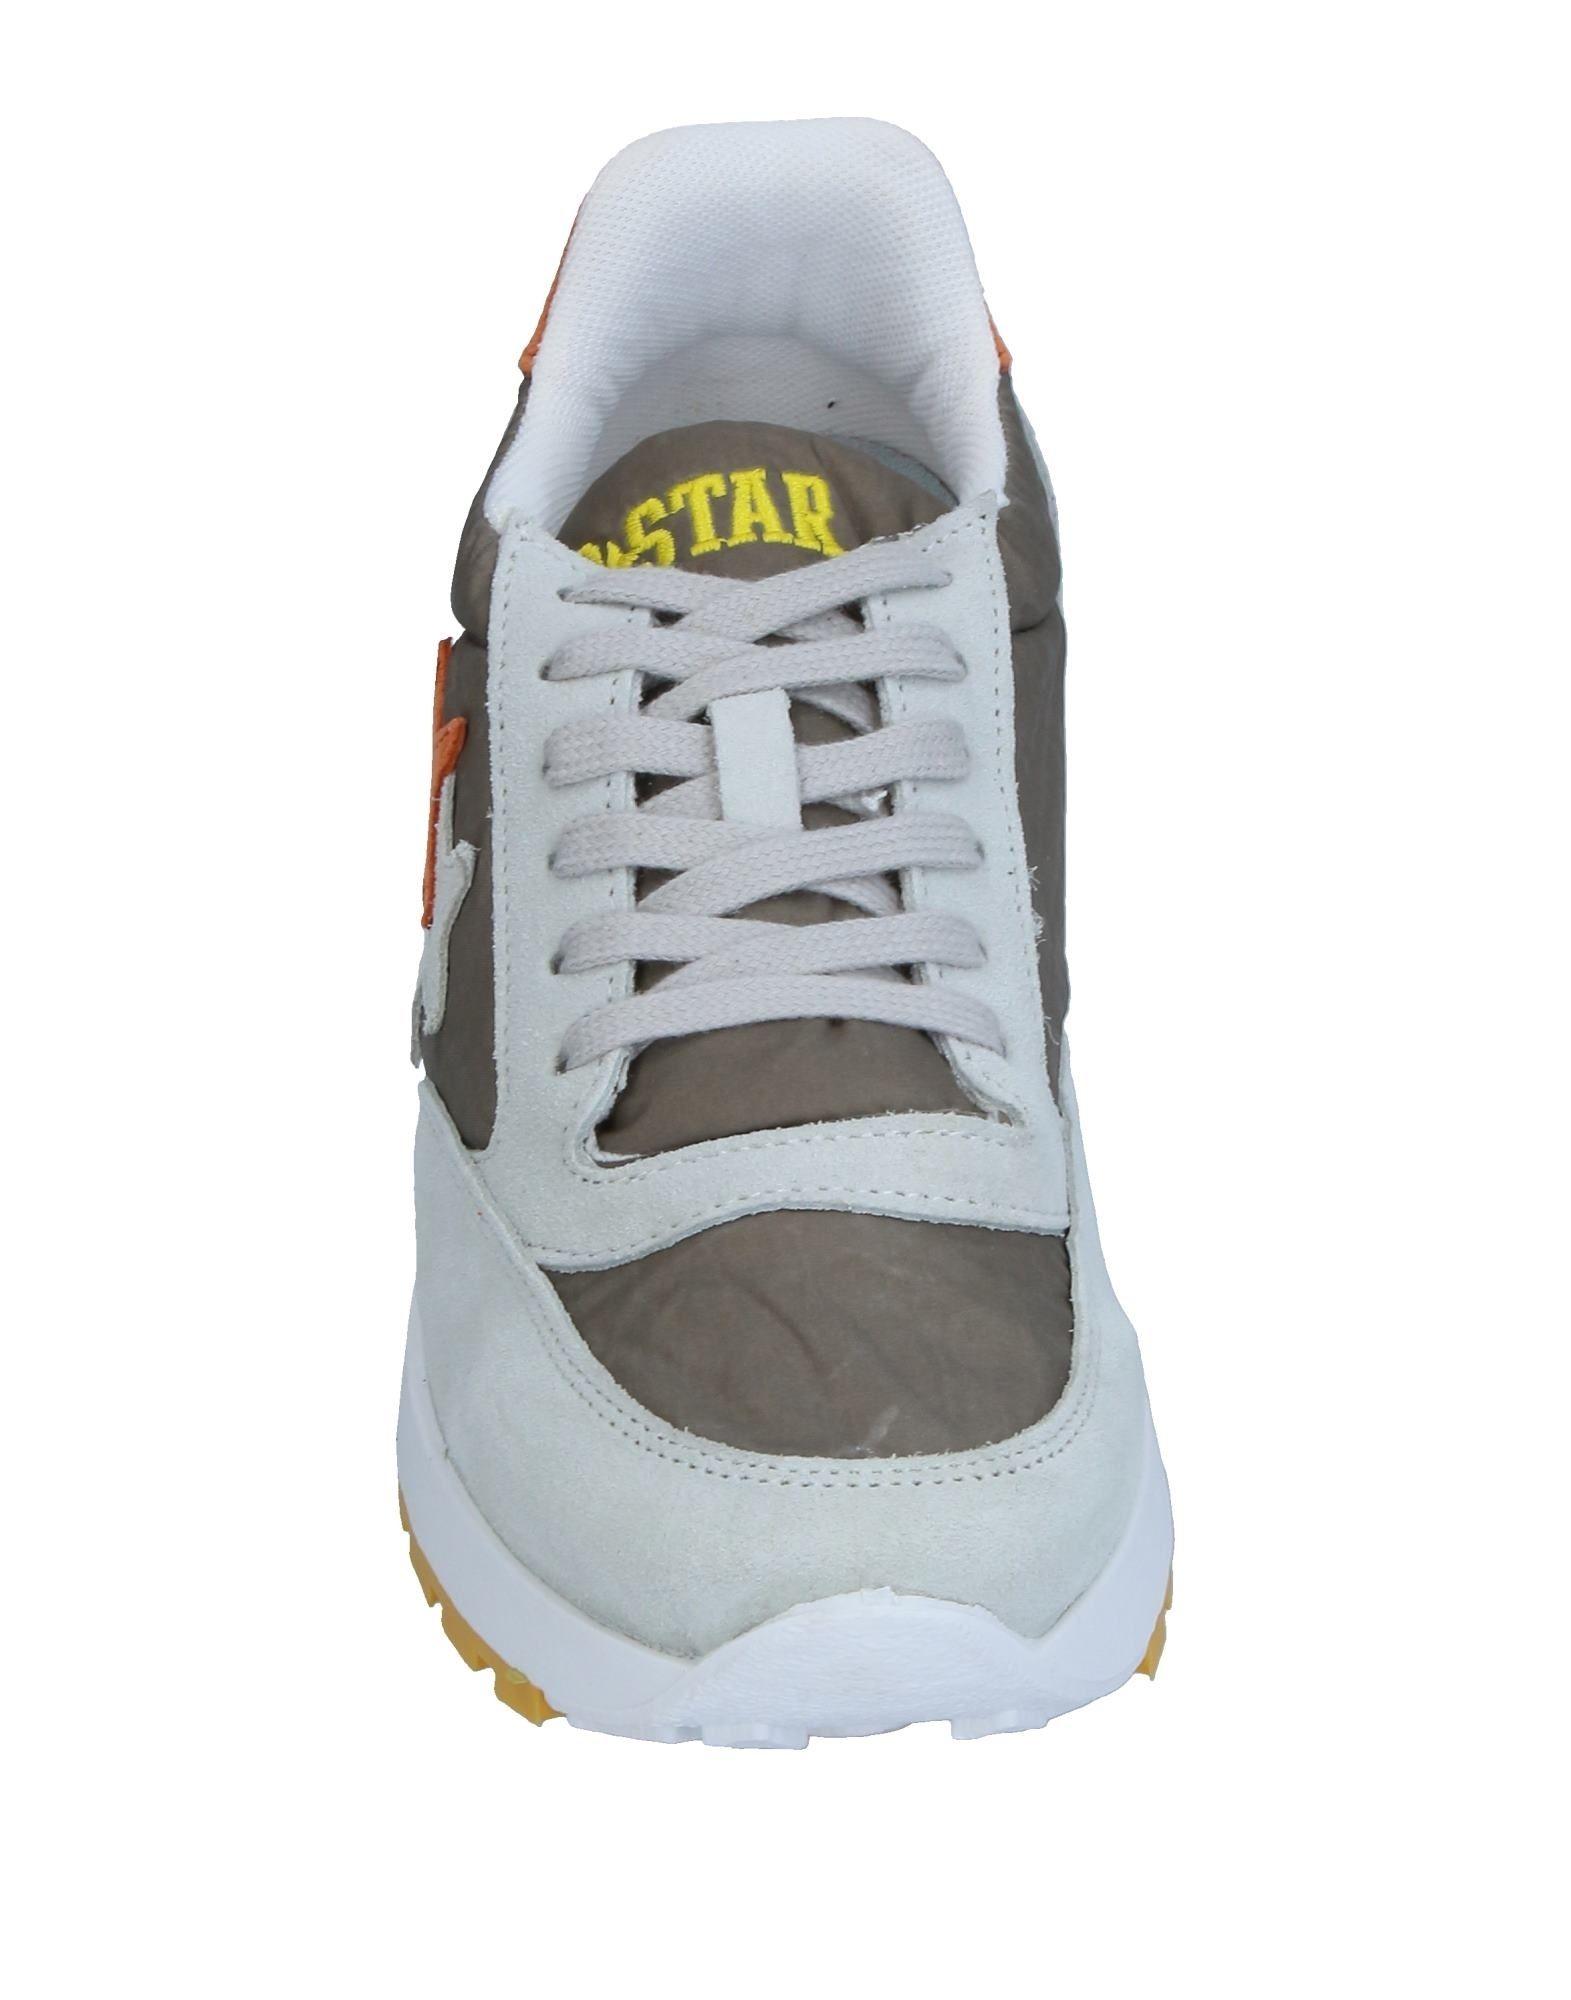 2Star Sneakers Sneakers 2Star Herren  11338501HA 2fdd55